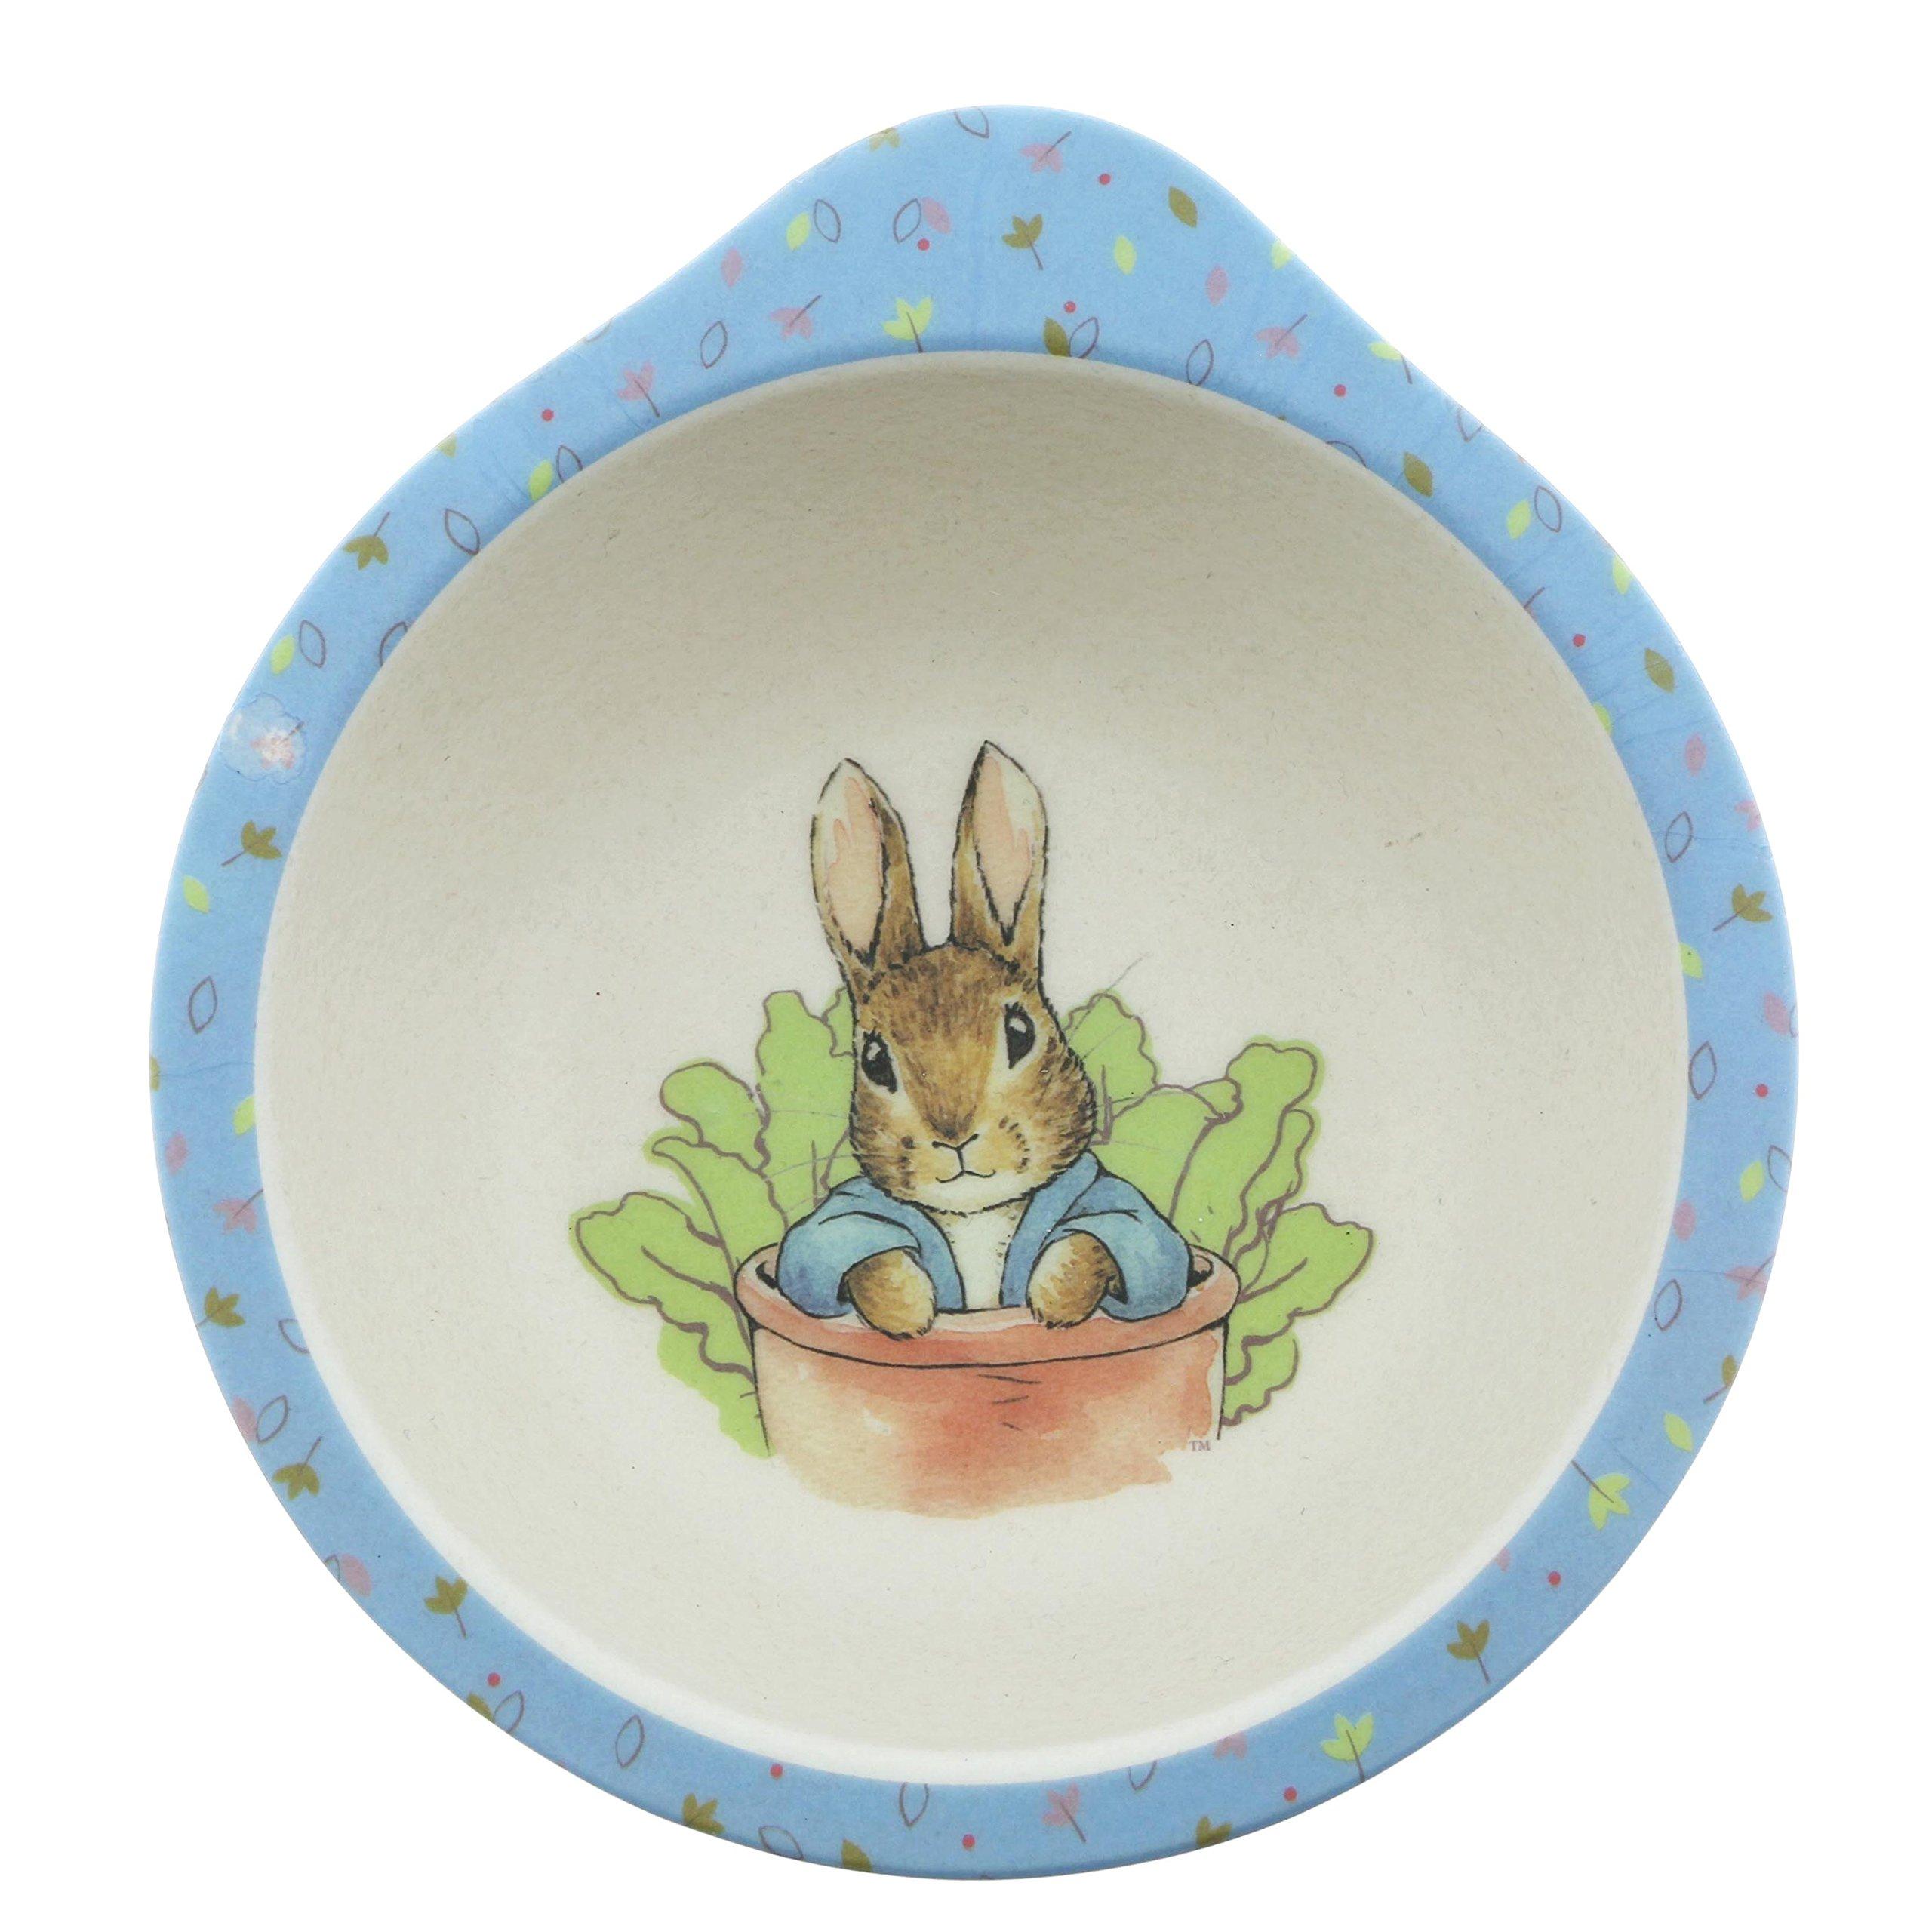 Beatrix Potter Peter Rabbit Featuring Peter Organic Bowl Made from Bamboo Height: 5.0cm Width: 12.5cm Depth: 12.5cm